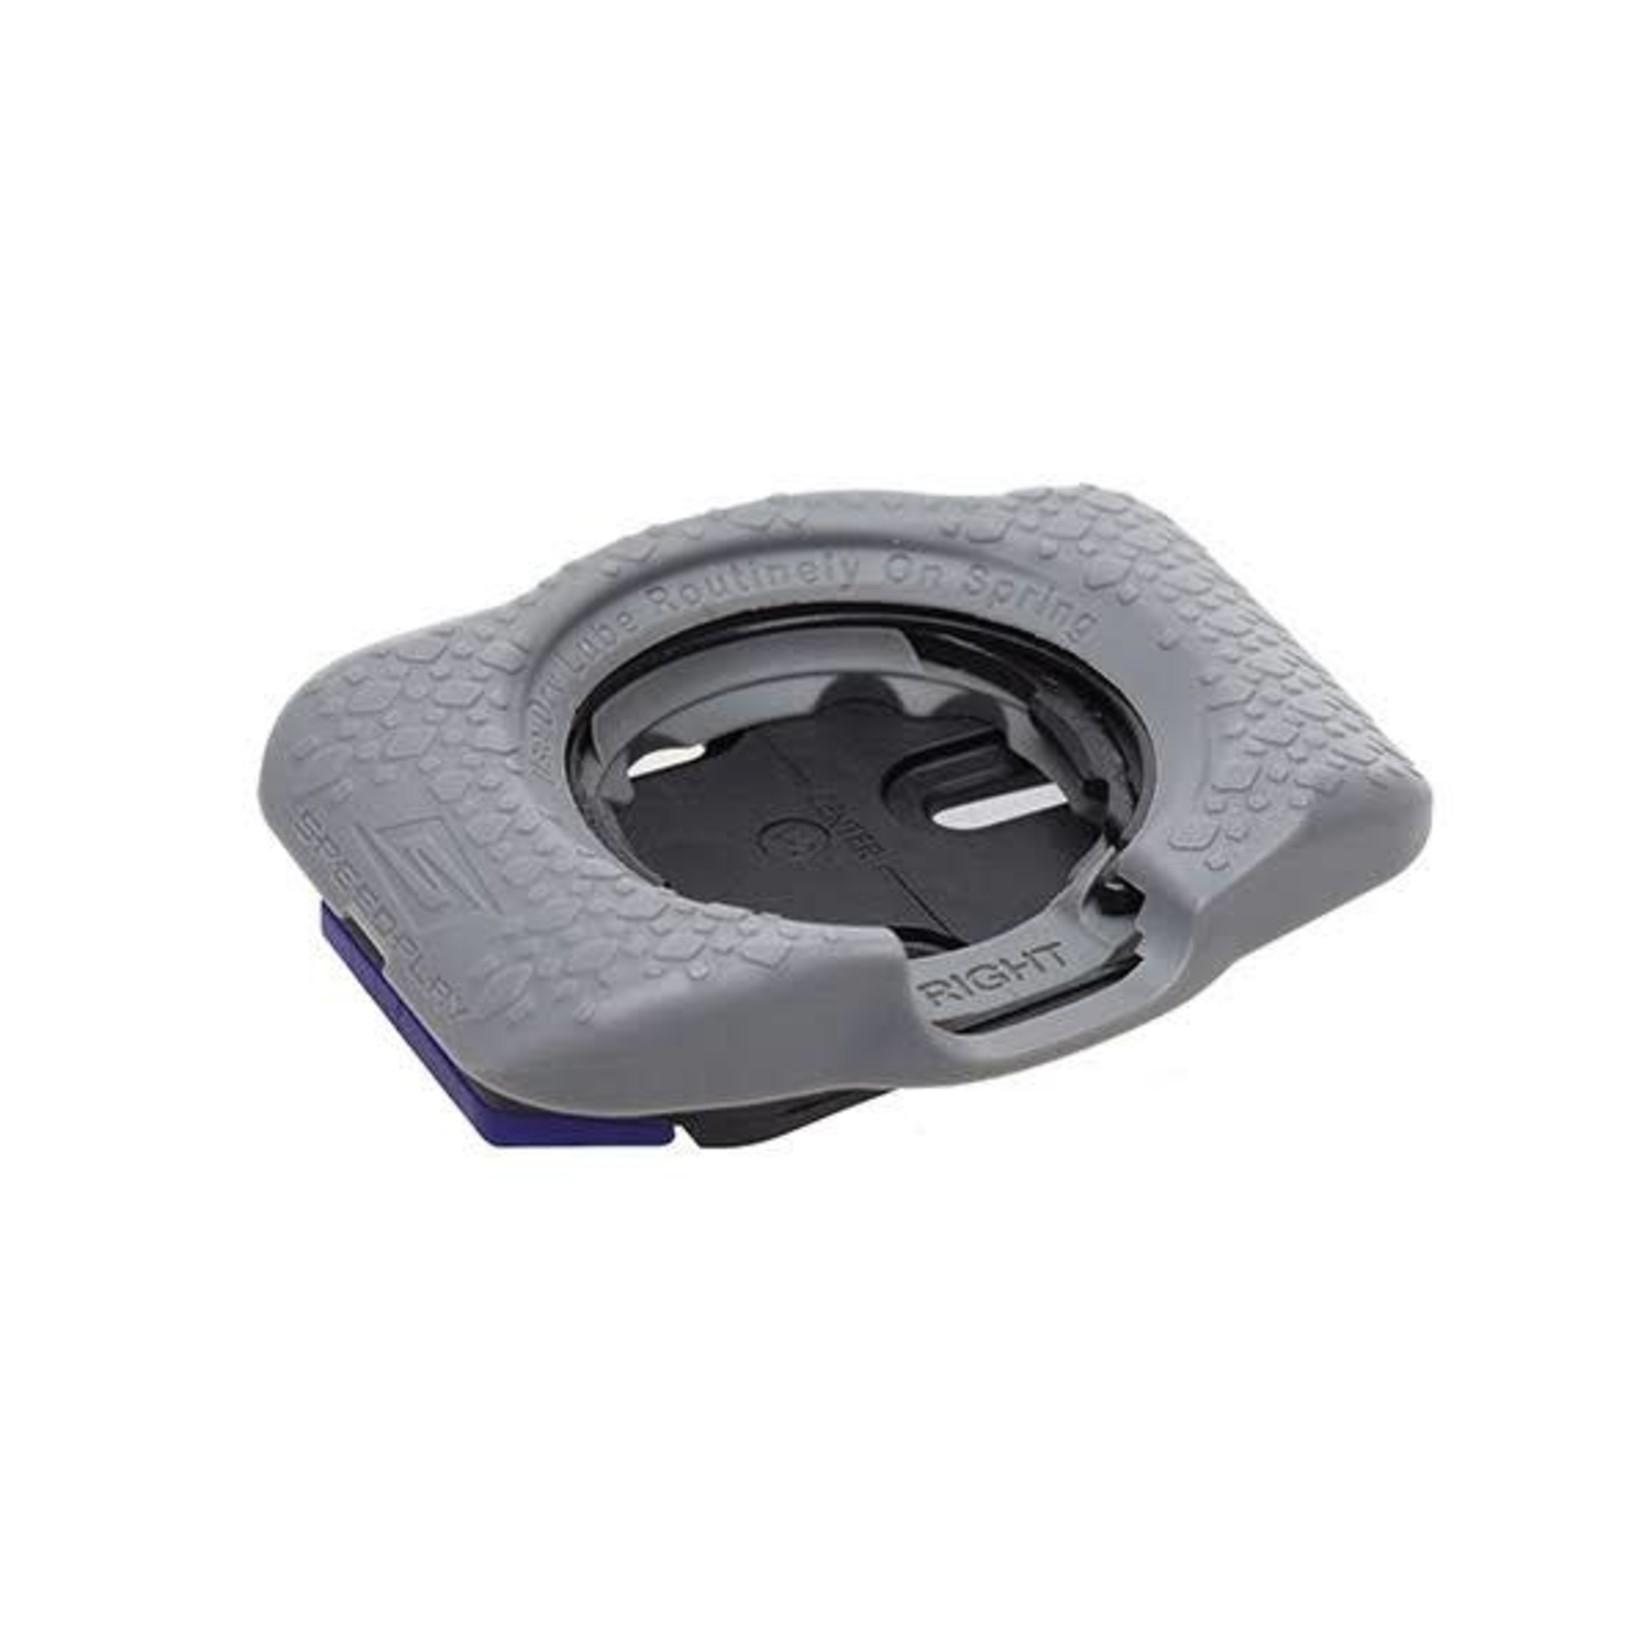 Speedplay Speedplay Light Action Walkable Cleat